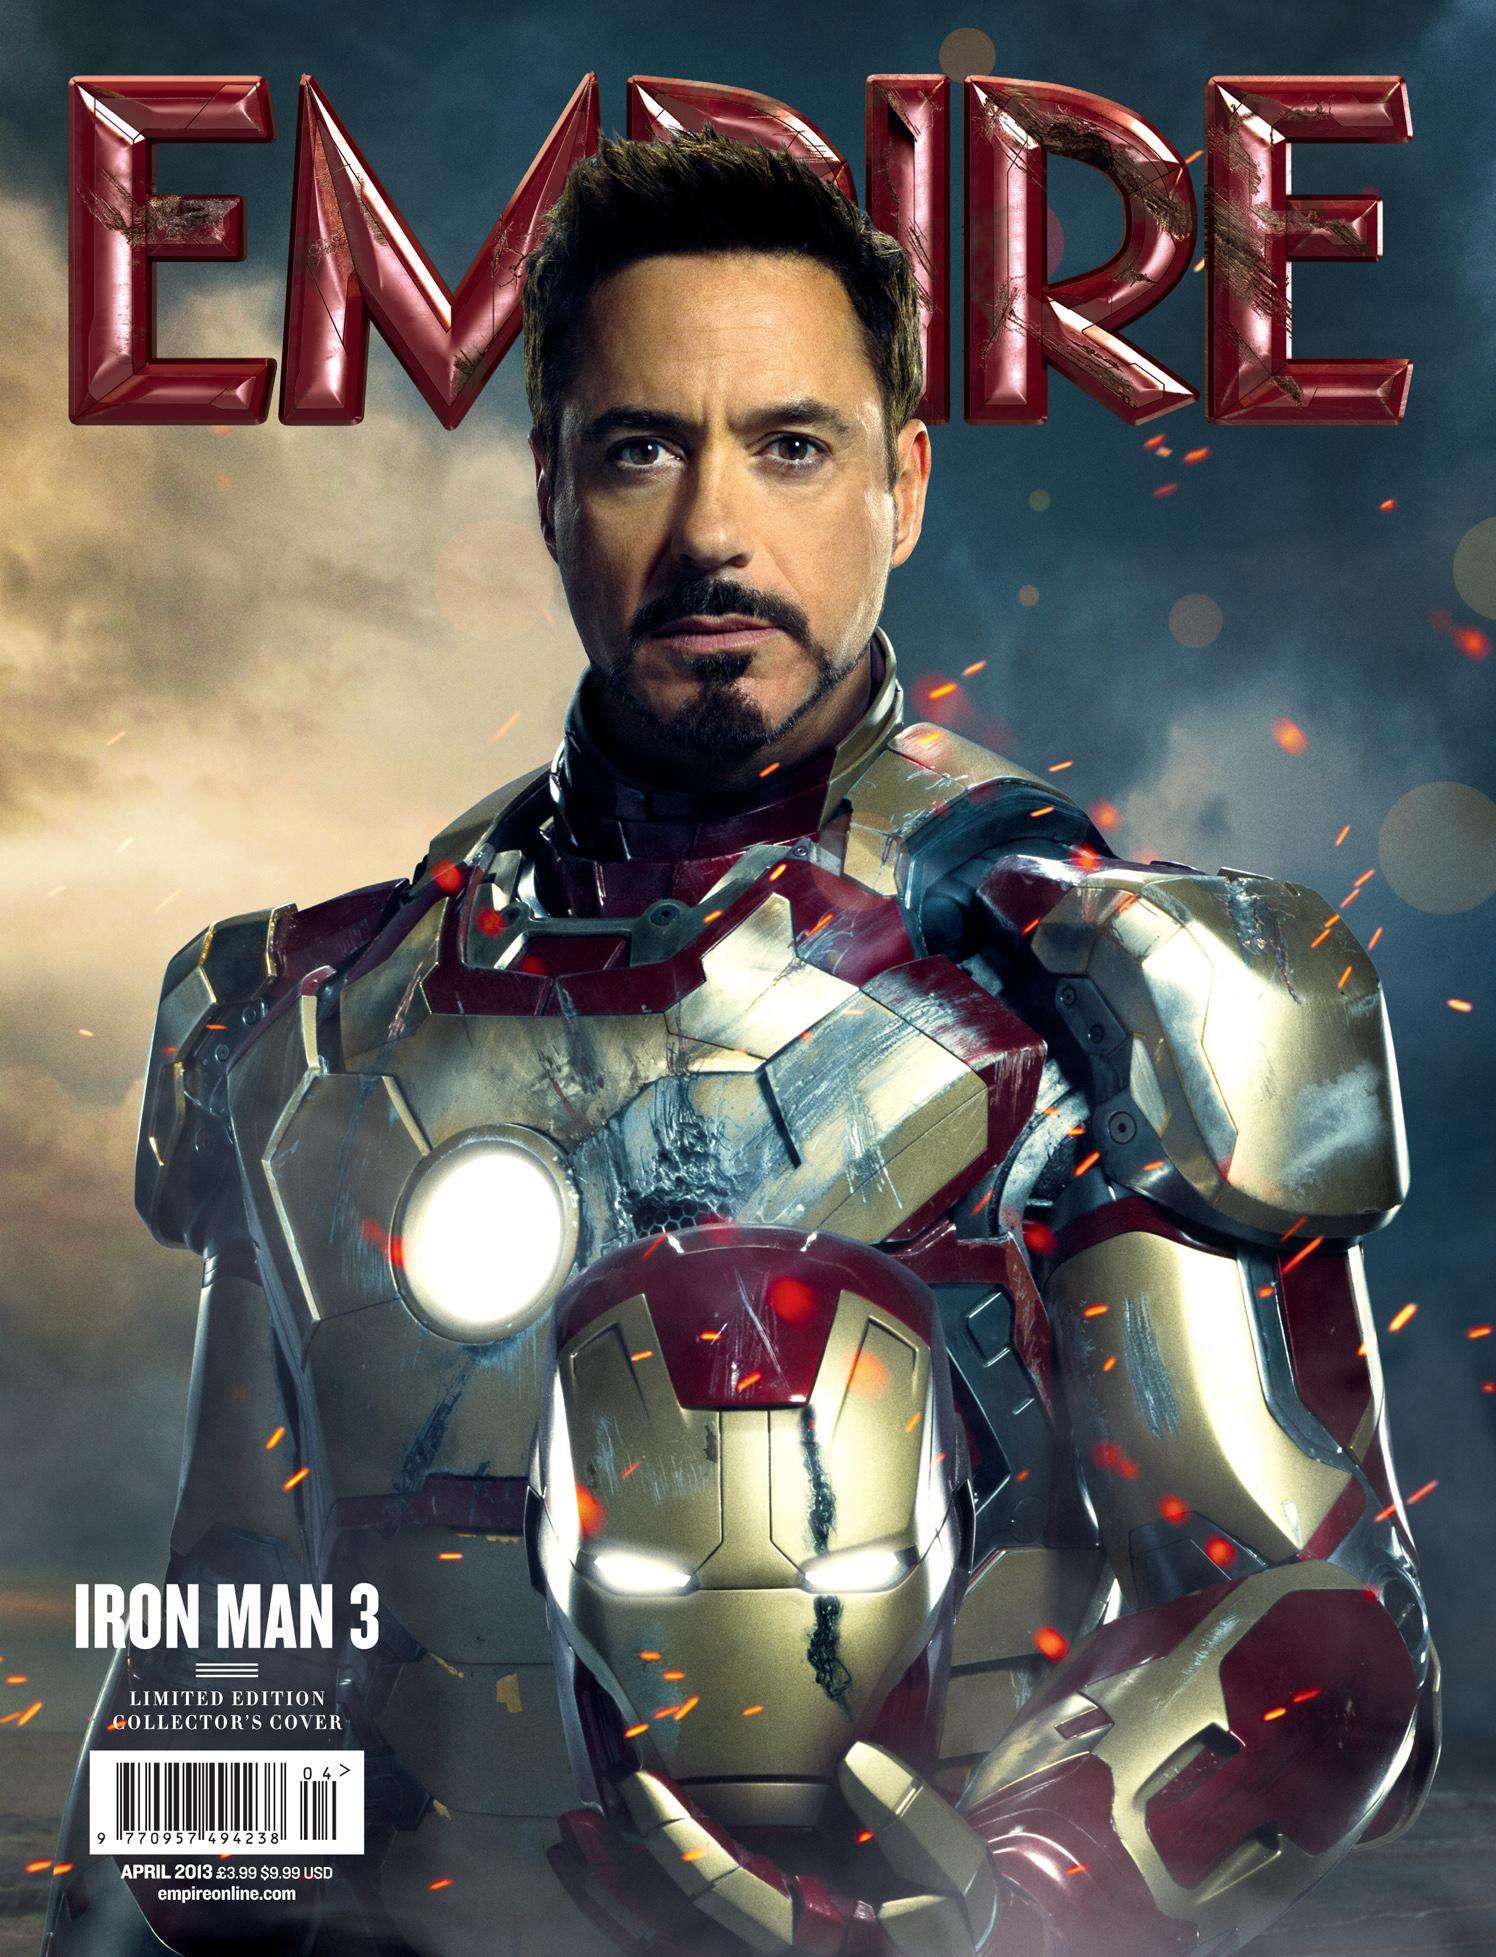 Iron Man 3 / Empire Magazine